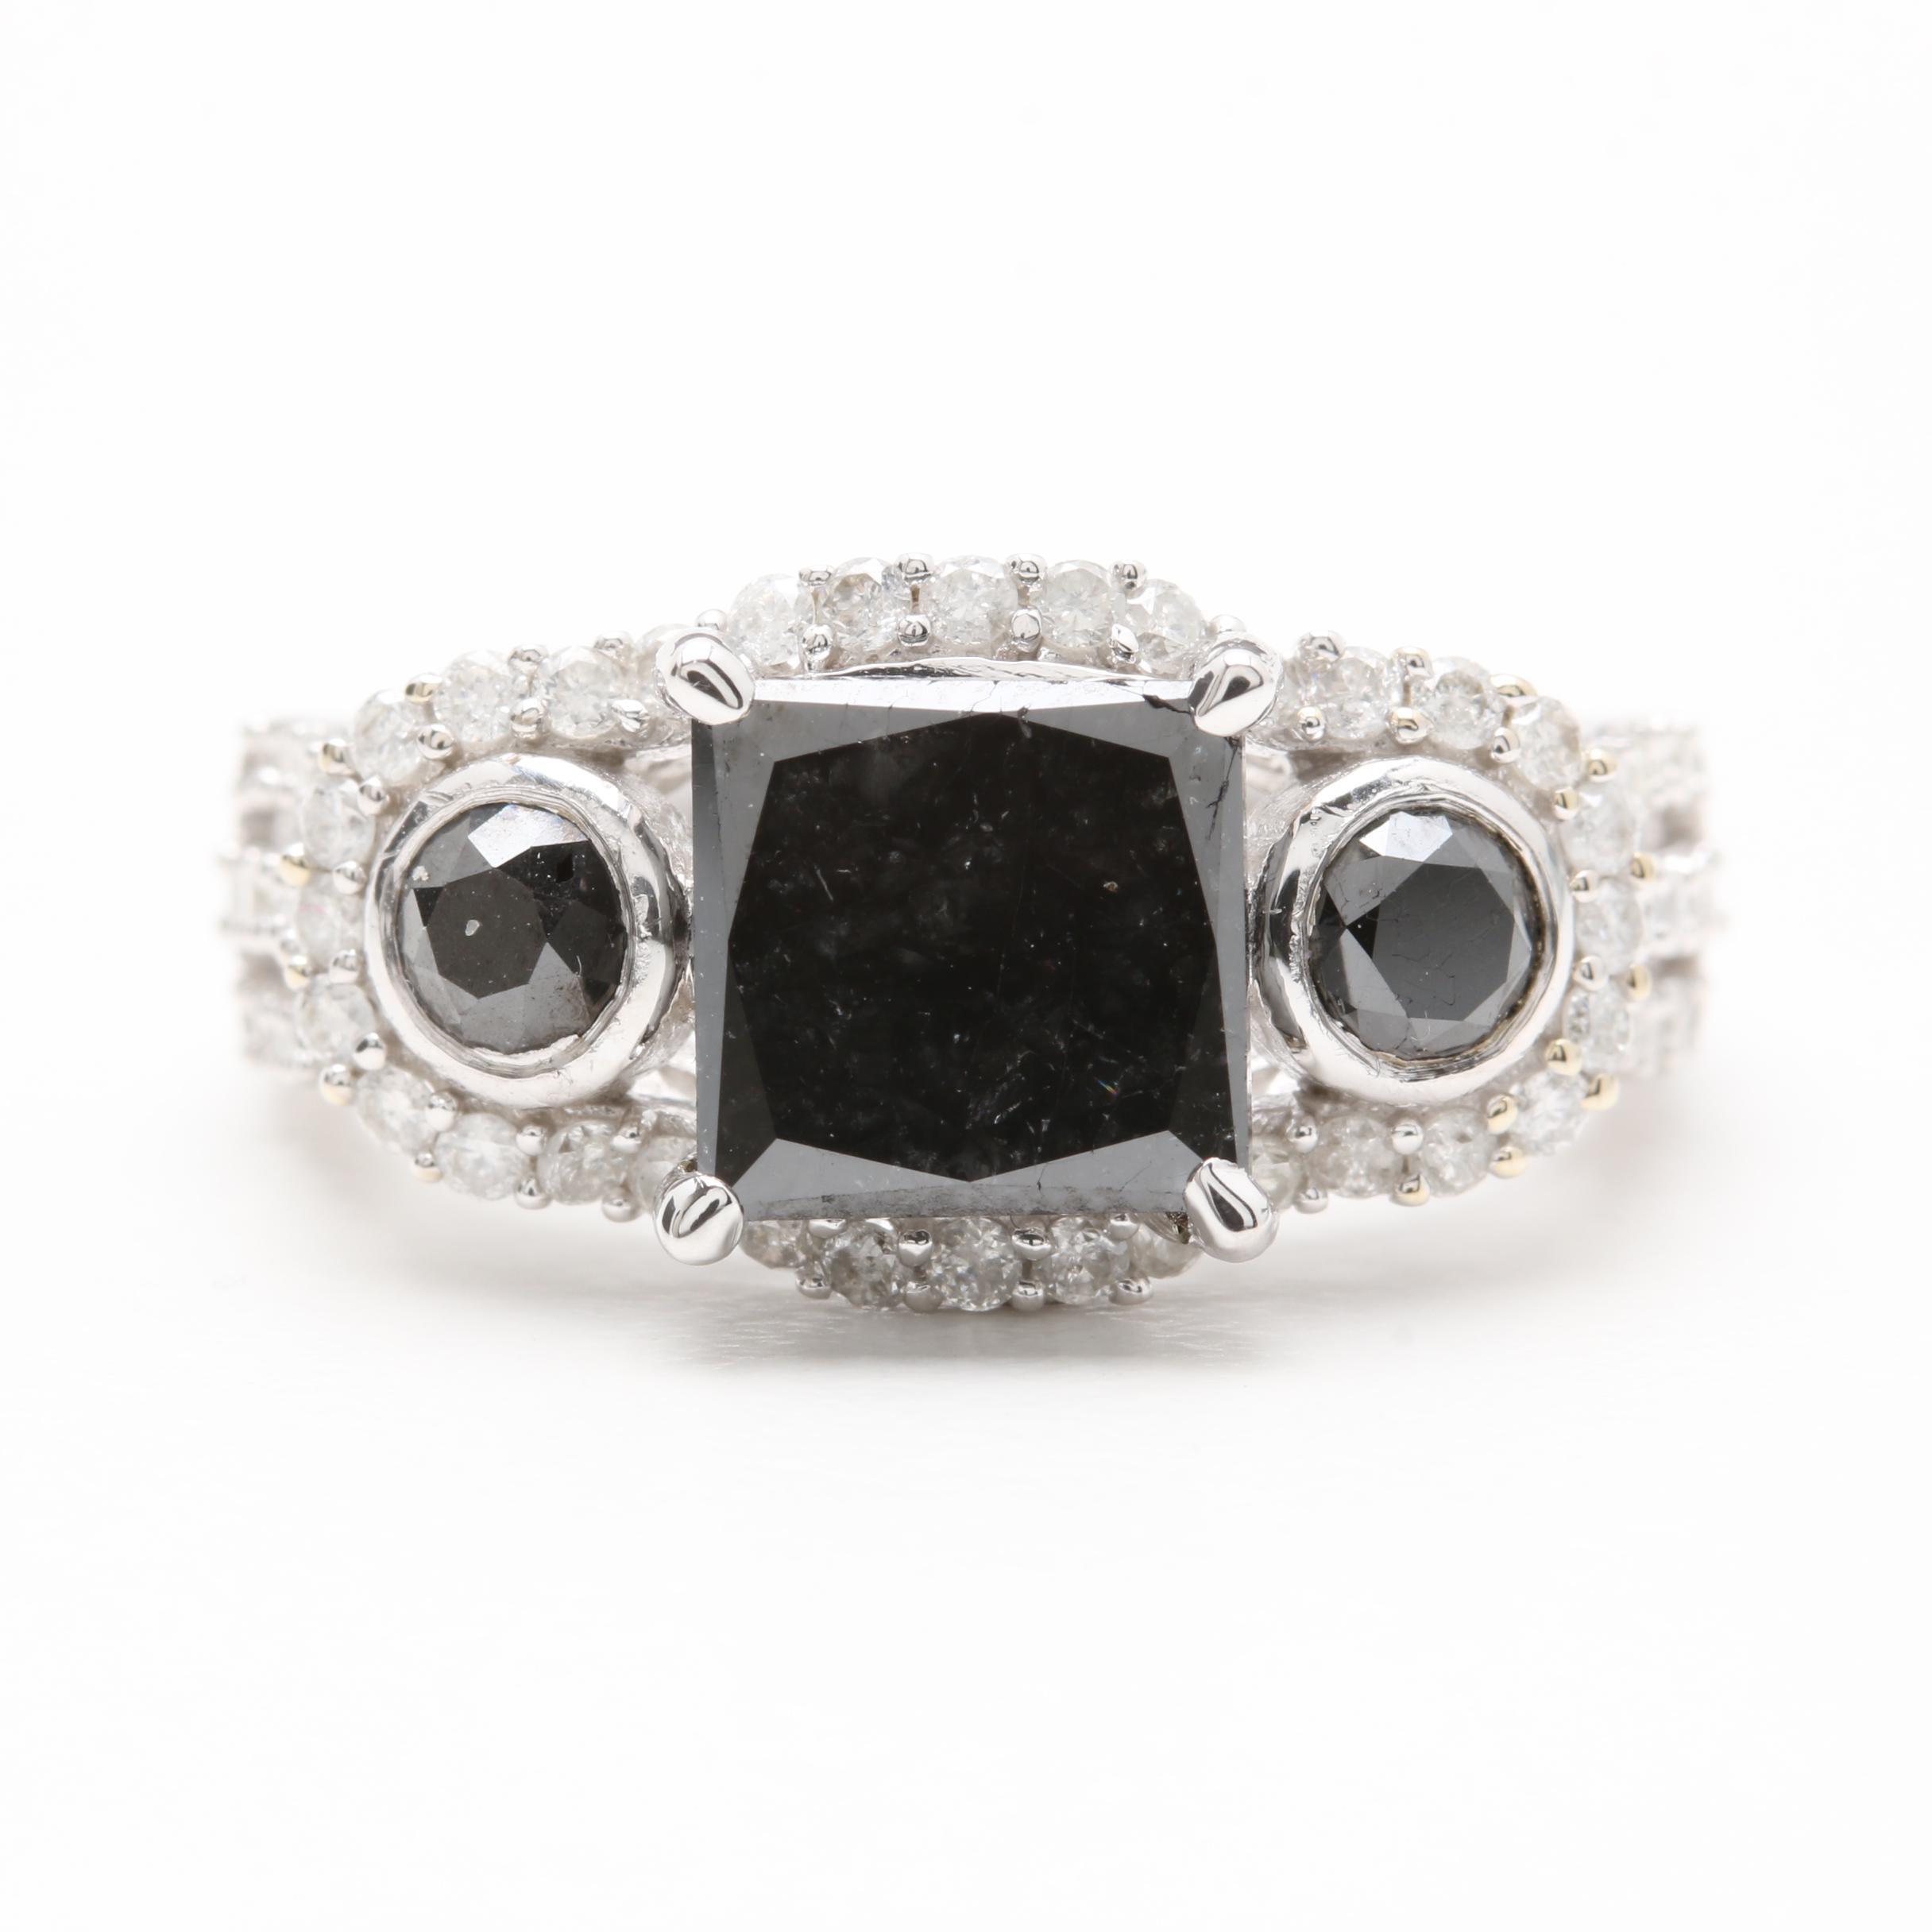 14K White Gold 3.09 CTW Diamond Ring Including Black Diamonds